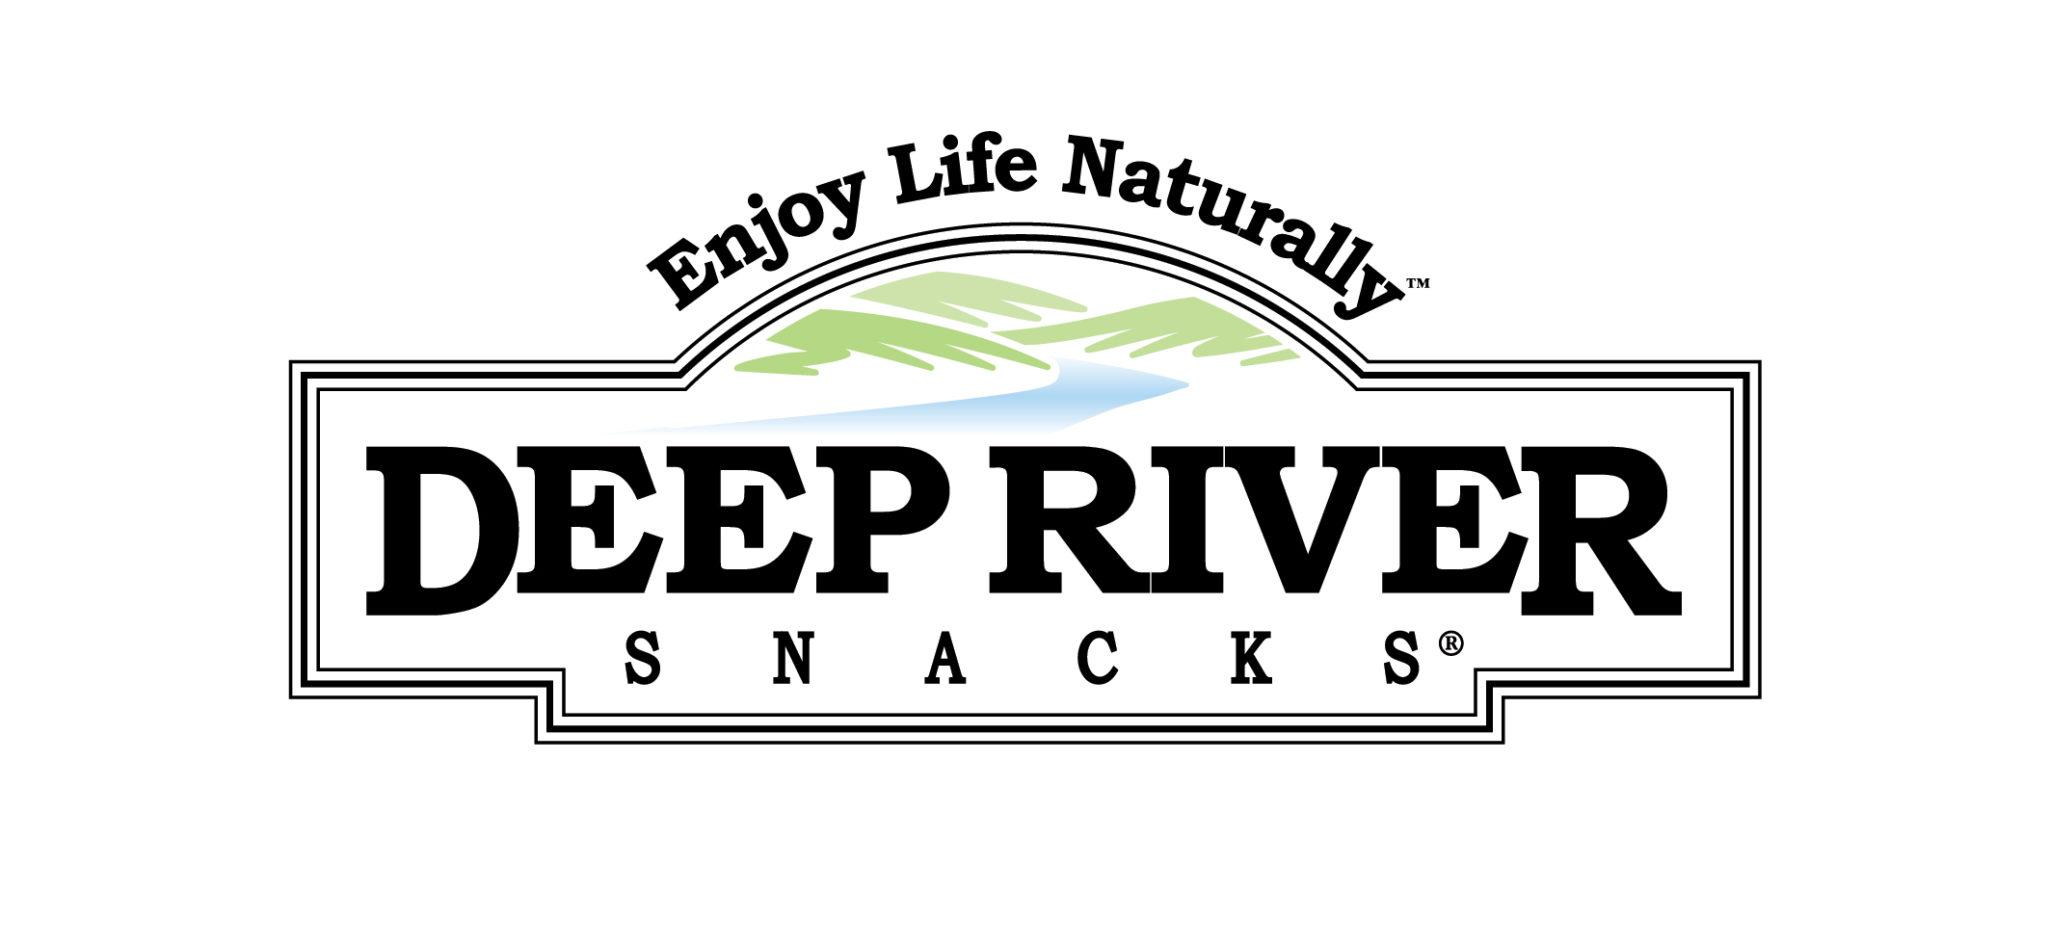 Deep River Snacks Potato Chip World Potato Chip World